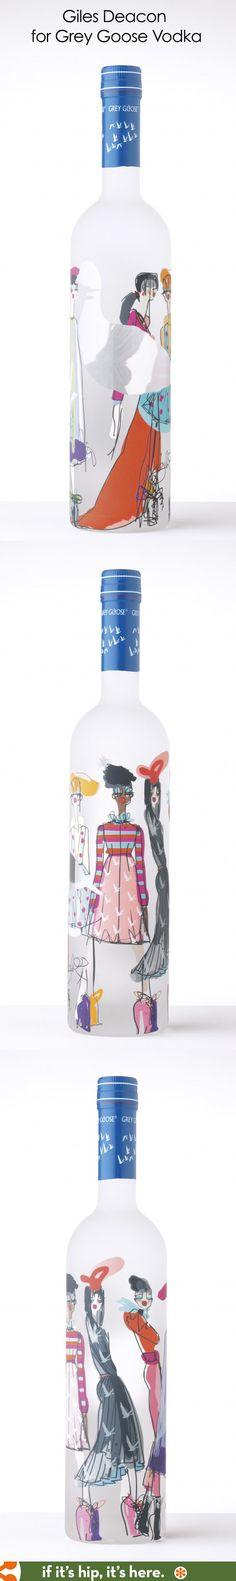 Giles Deacon's special bottle for Grey Goose Vodka